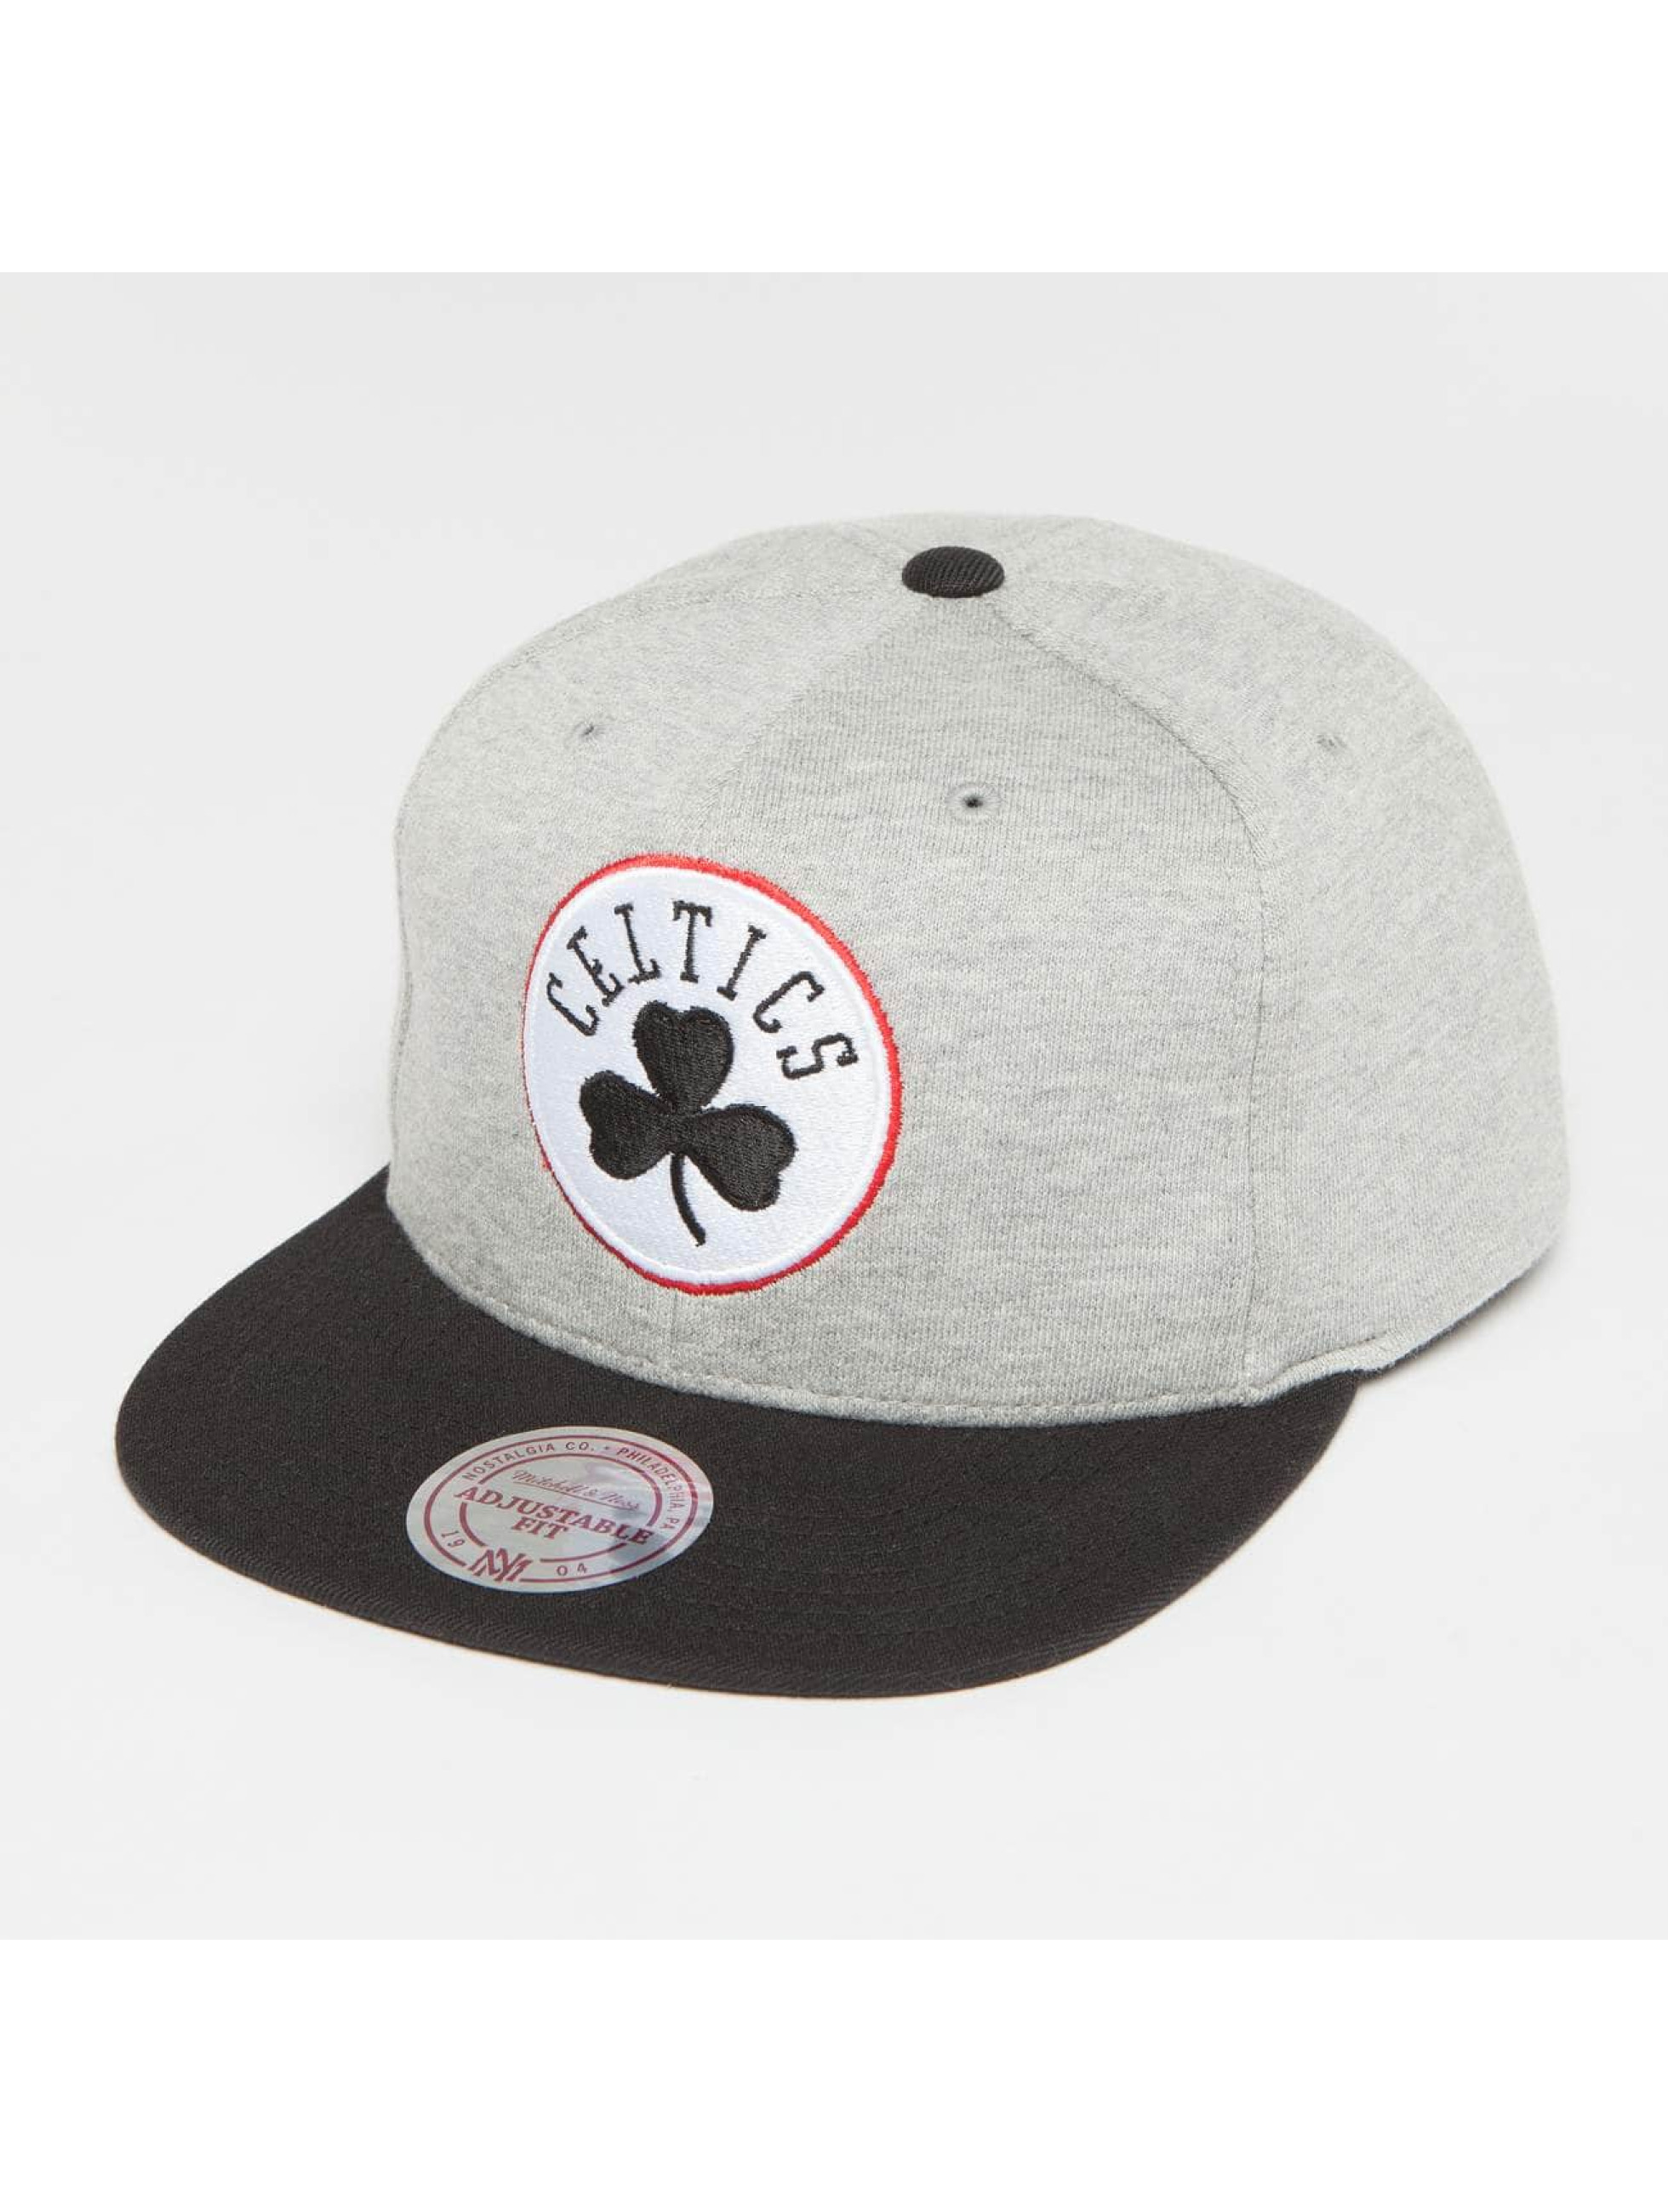 Mitchell & Ness Snapback Cap The 3-Tone NBA Bosten Celtics grey